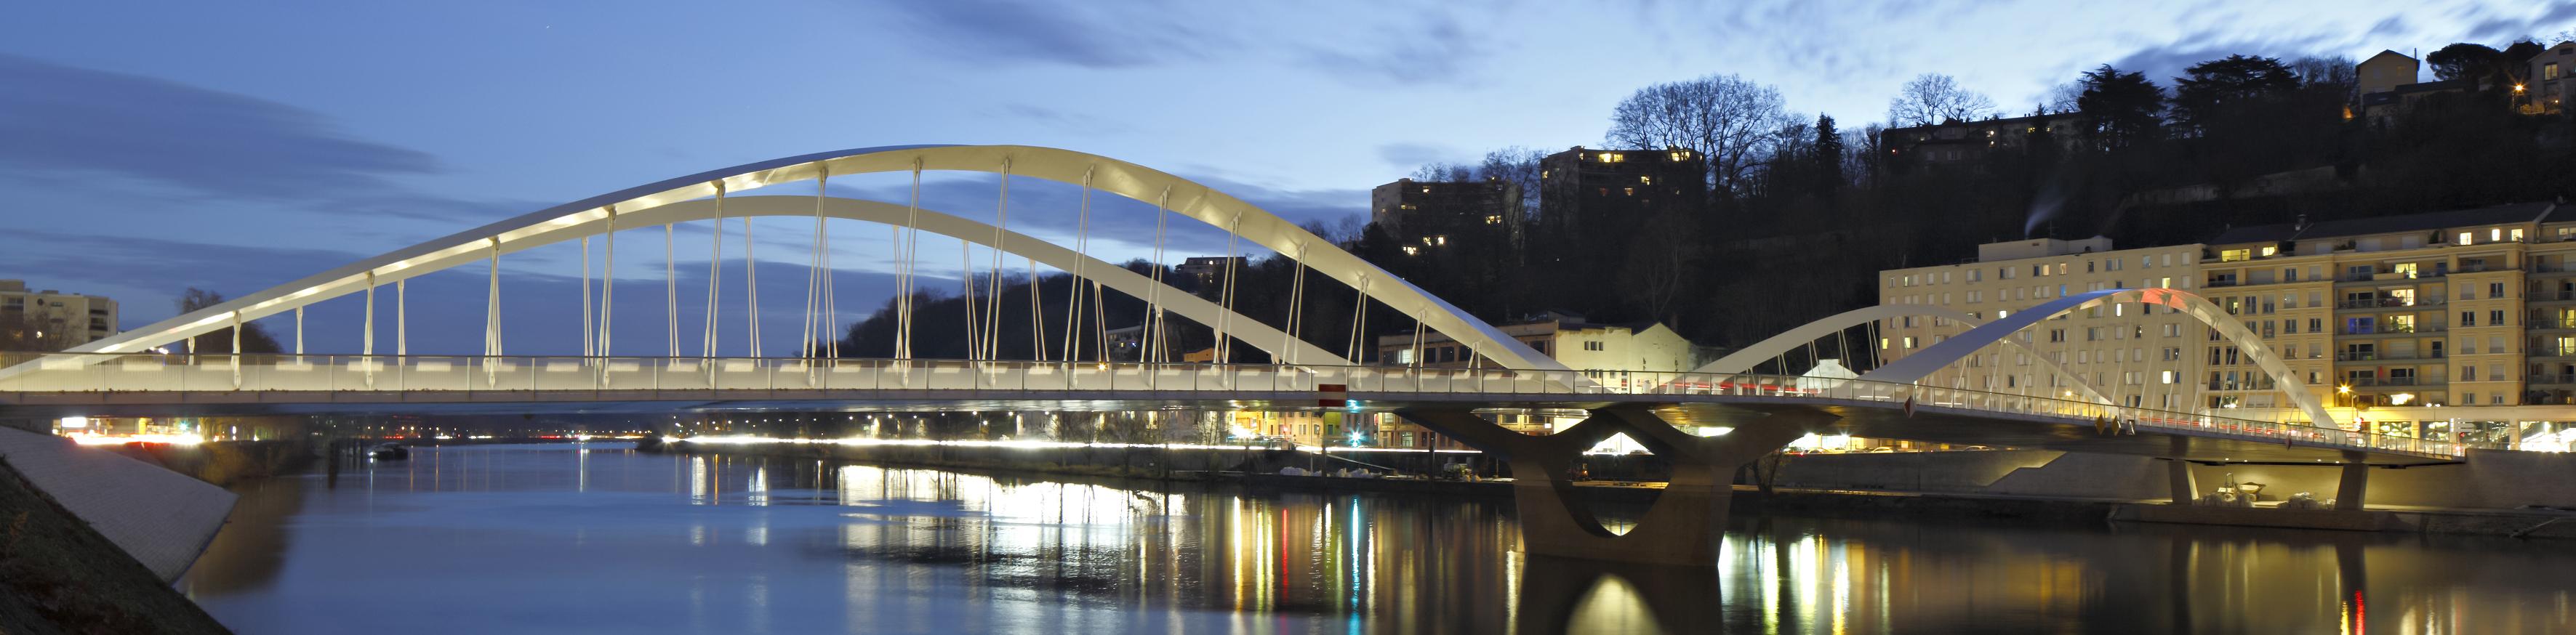 Pont Schuman image hero